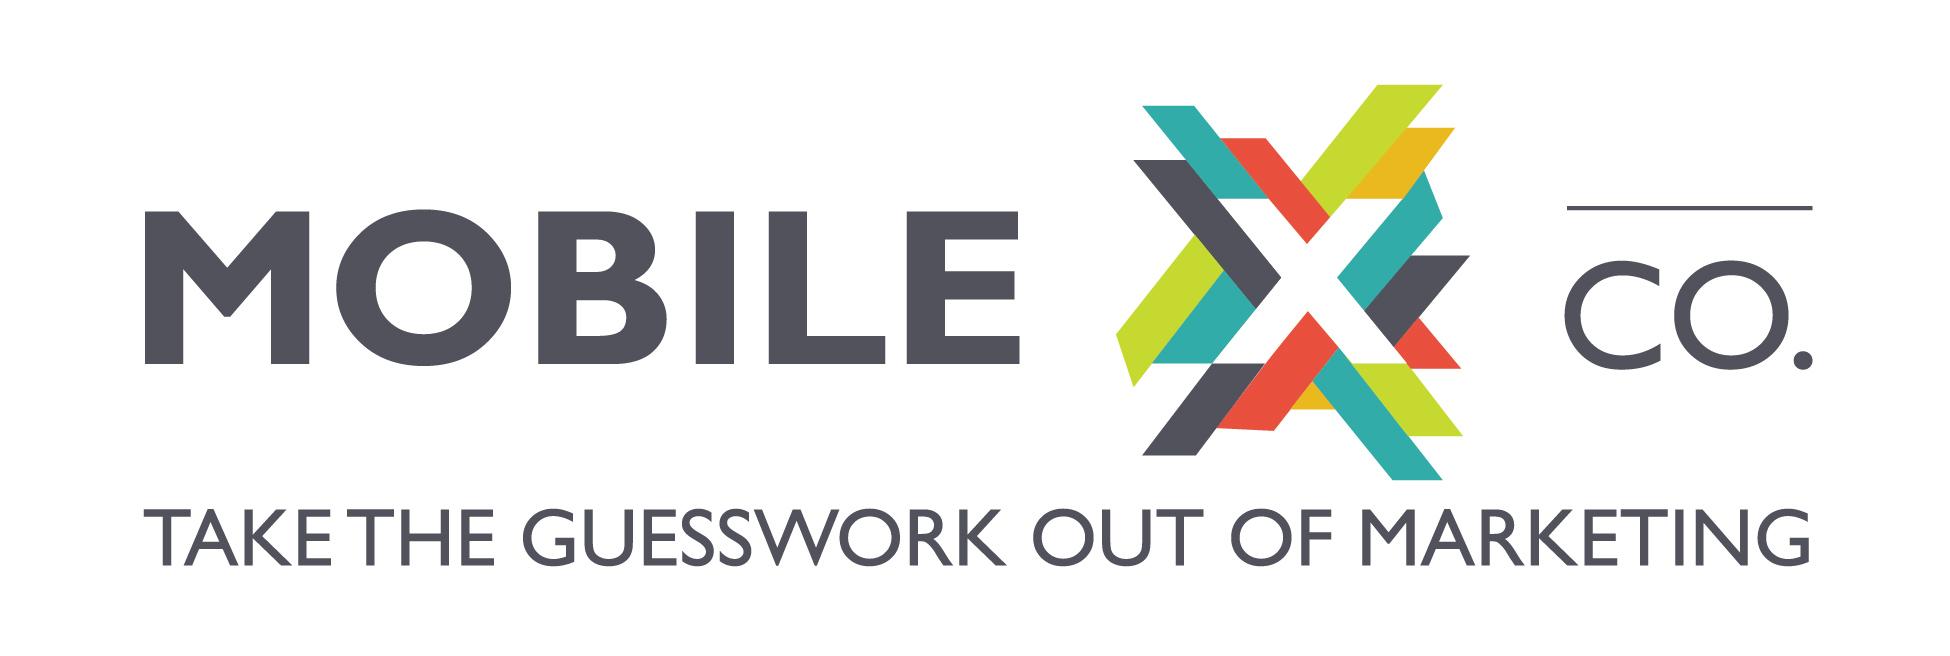 MobileXCo Vector Logo w tagline 03-15-2018-01